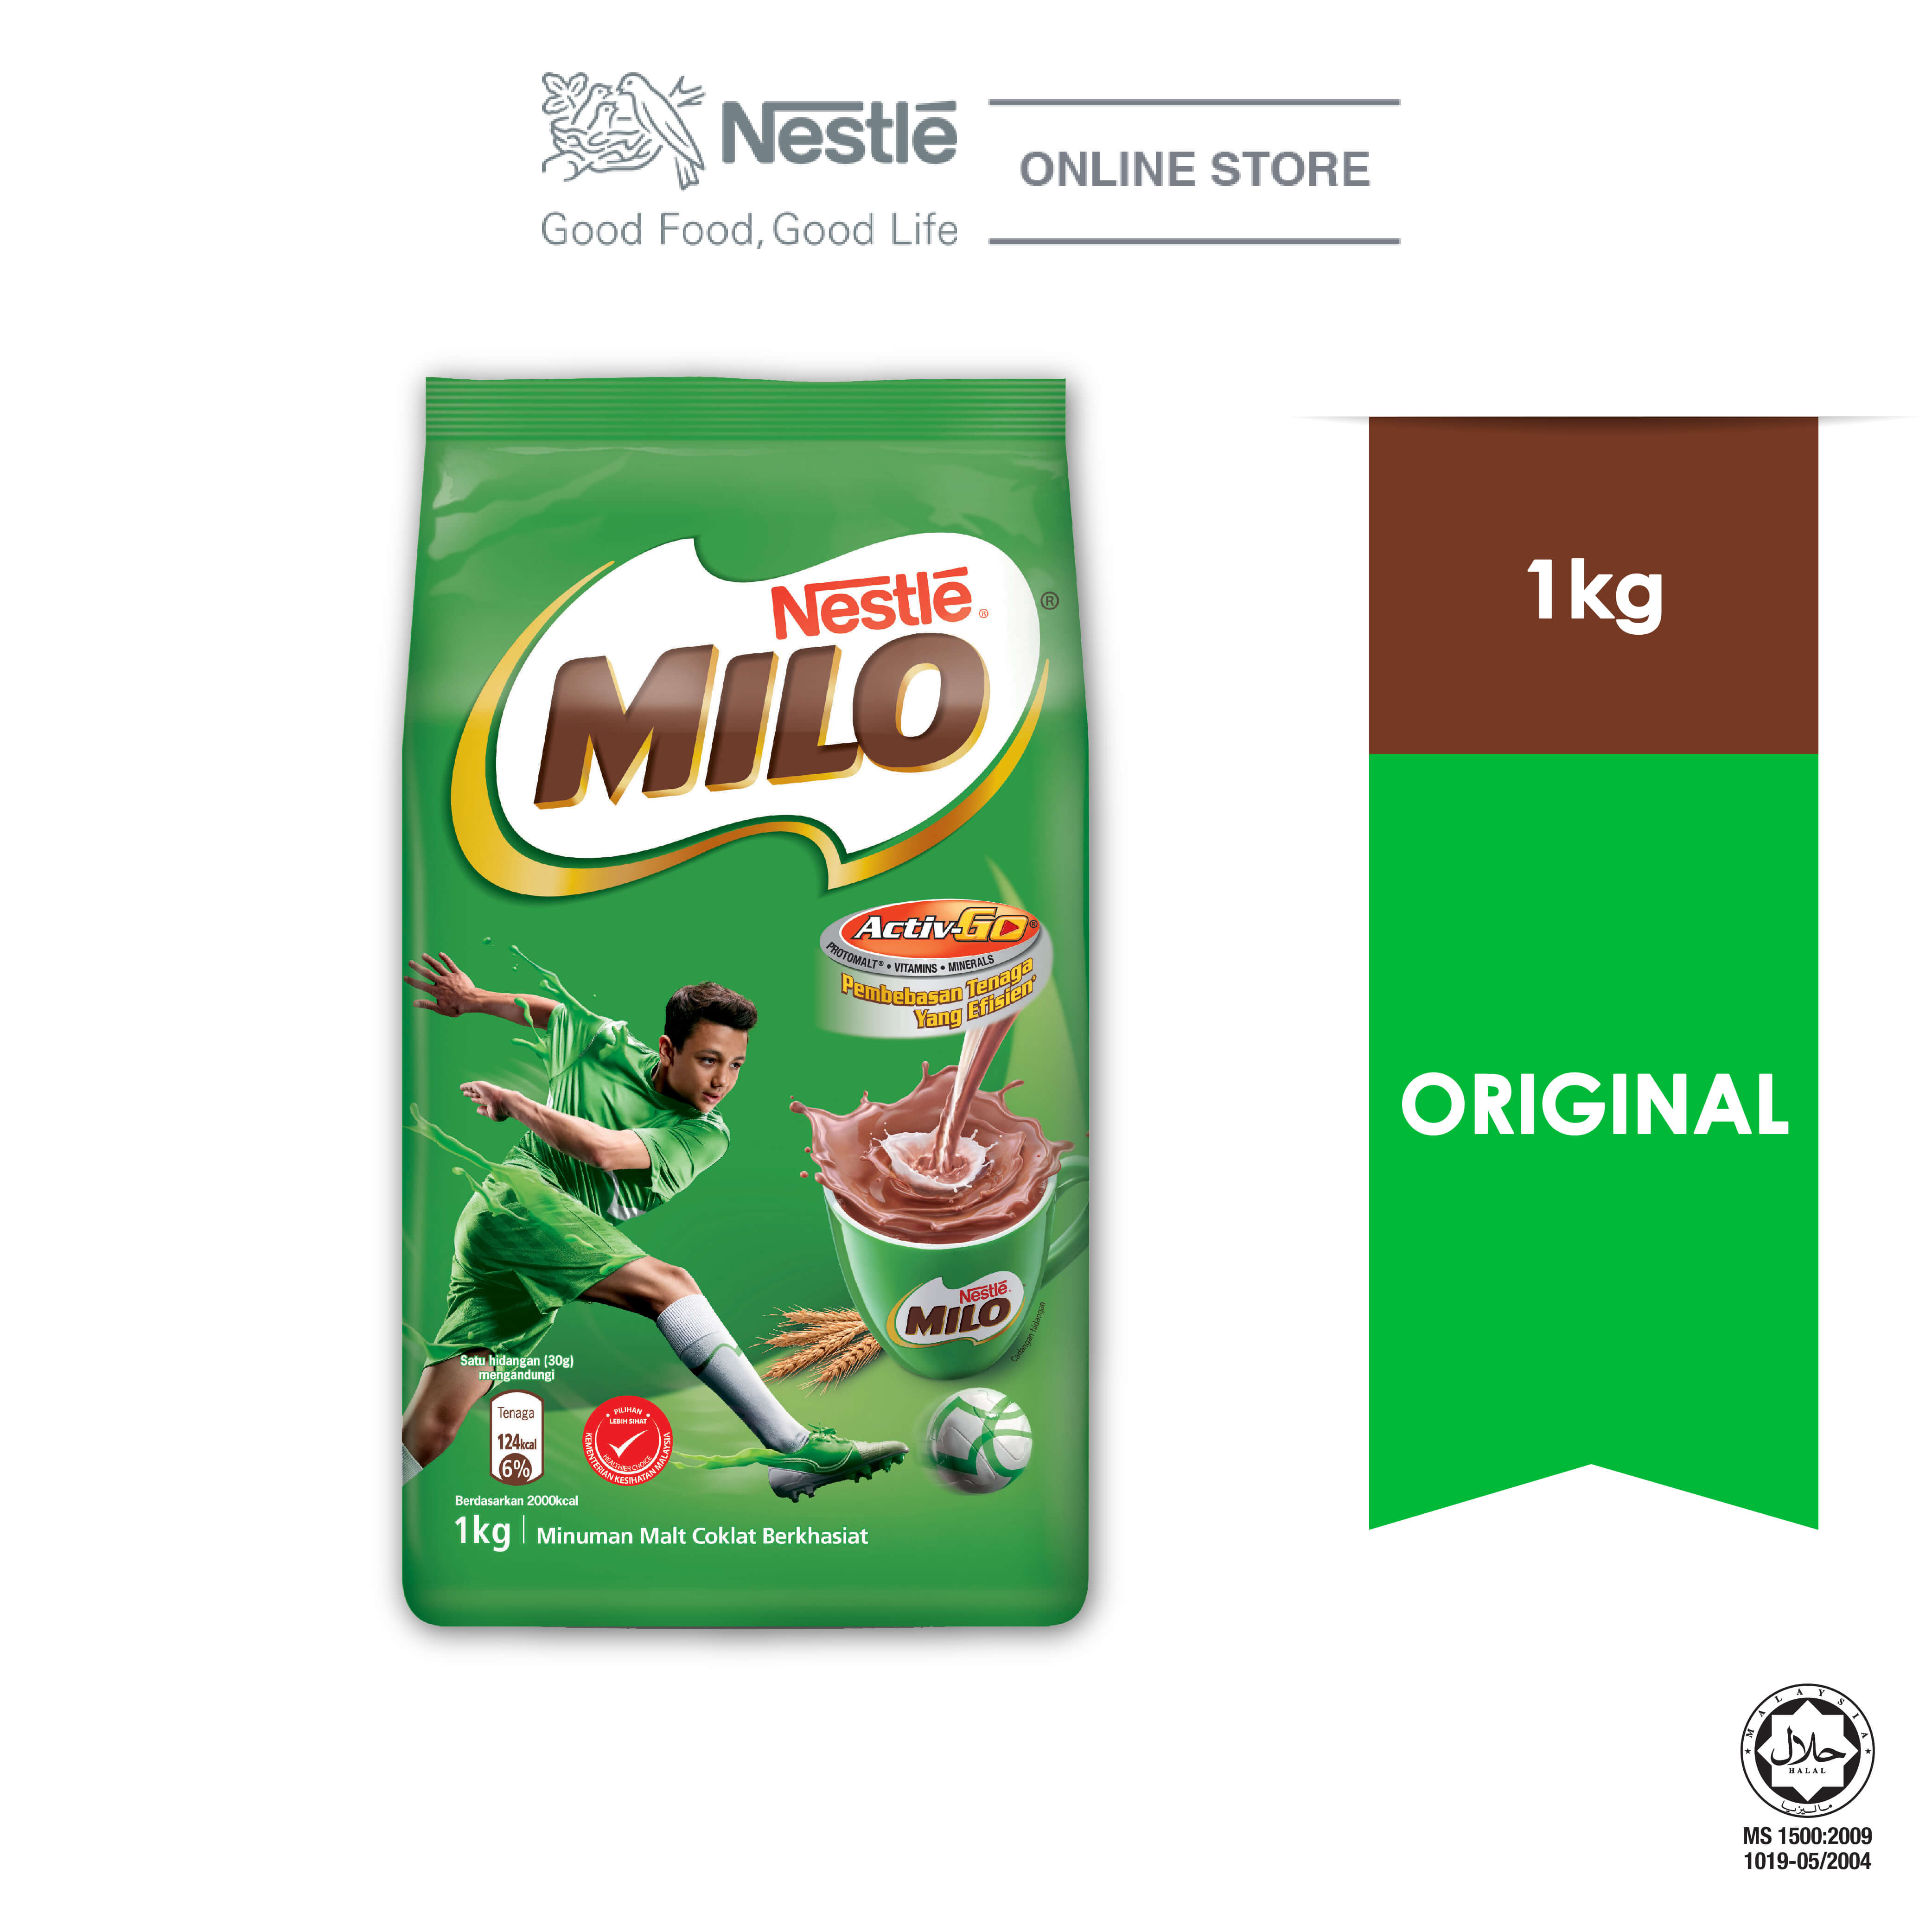 NESTLE MILO ACTIV-GO CHOCOLATE MALT POWDER Soft Pack 1kg ExpDate: AUG20